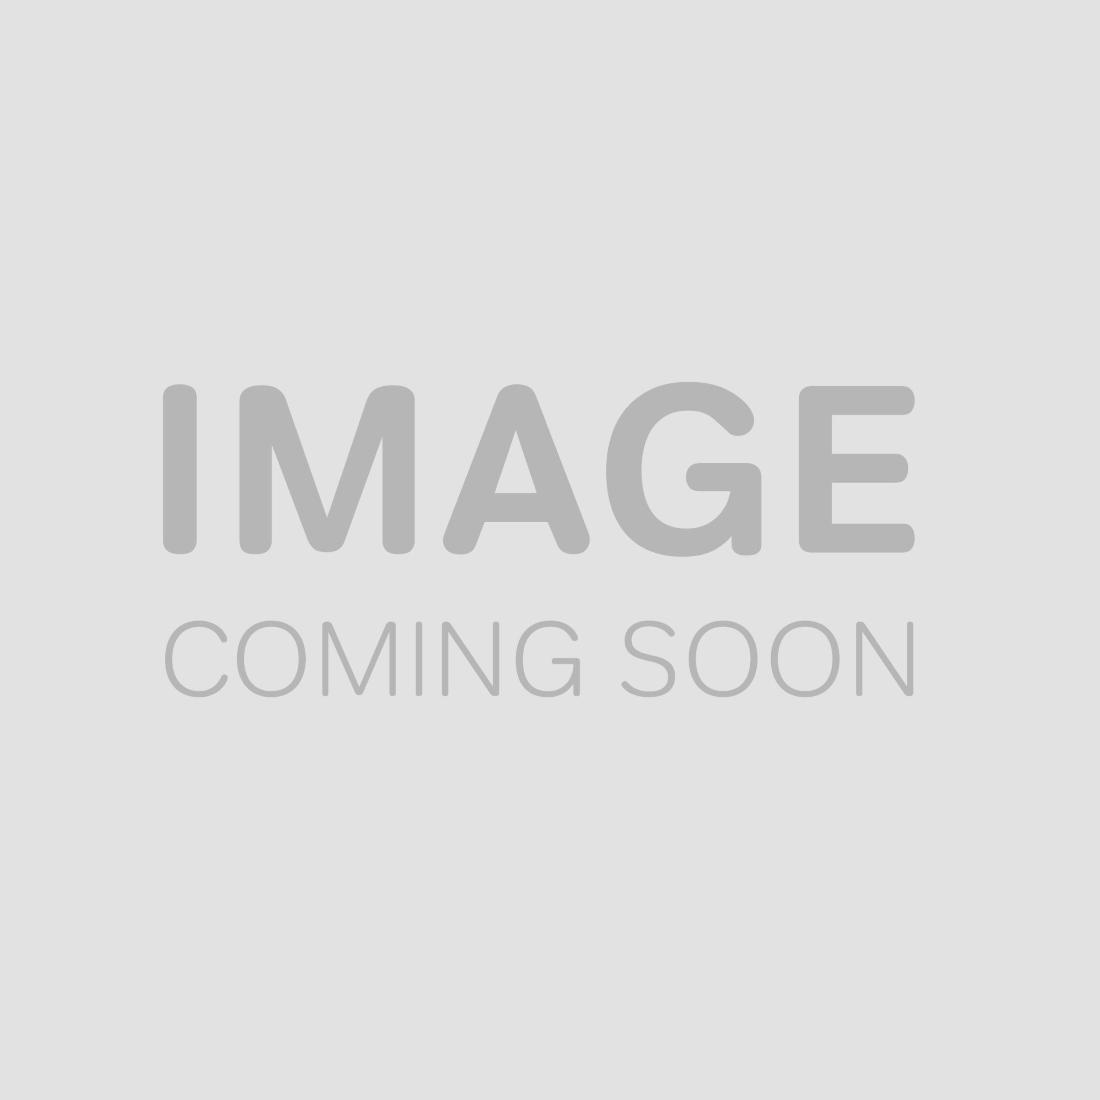 Washable Unisex Vinyl Pull On Pant - EXTRA LARGE - Pack of 3